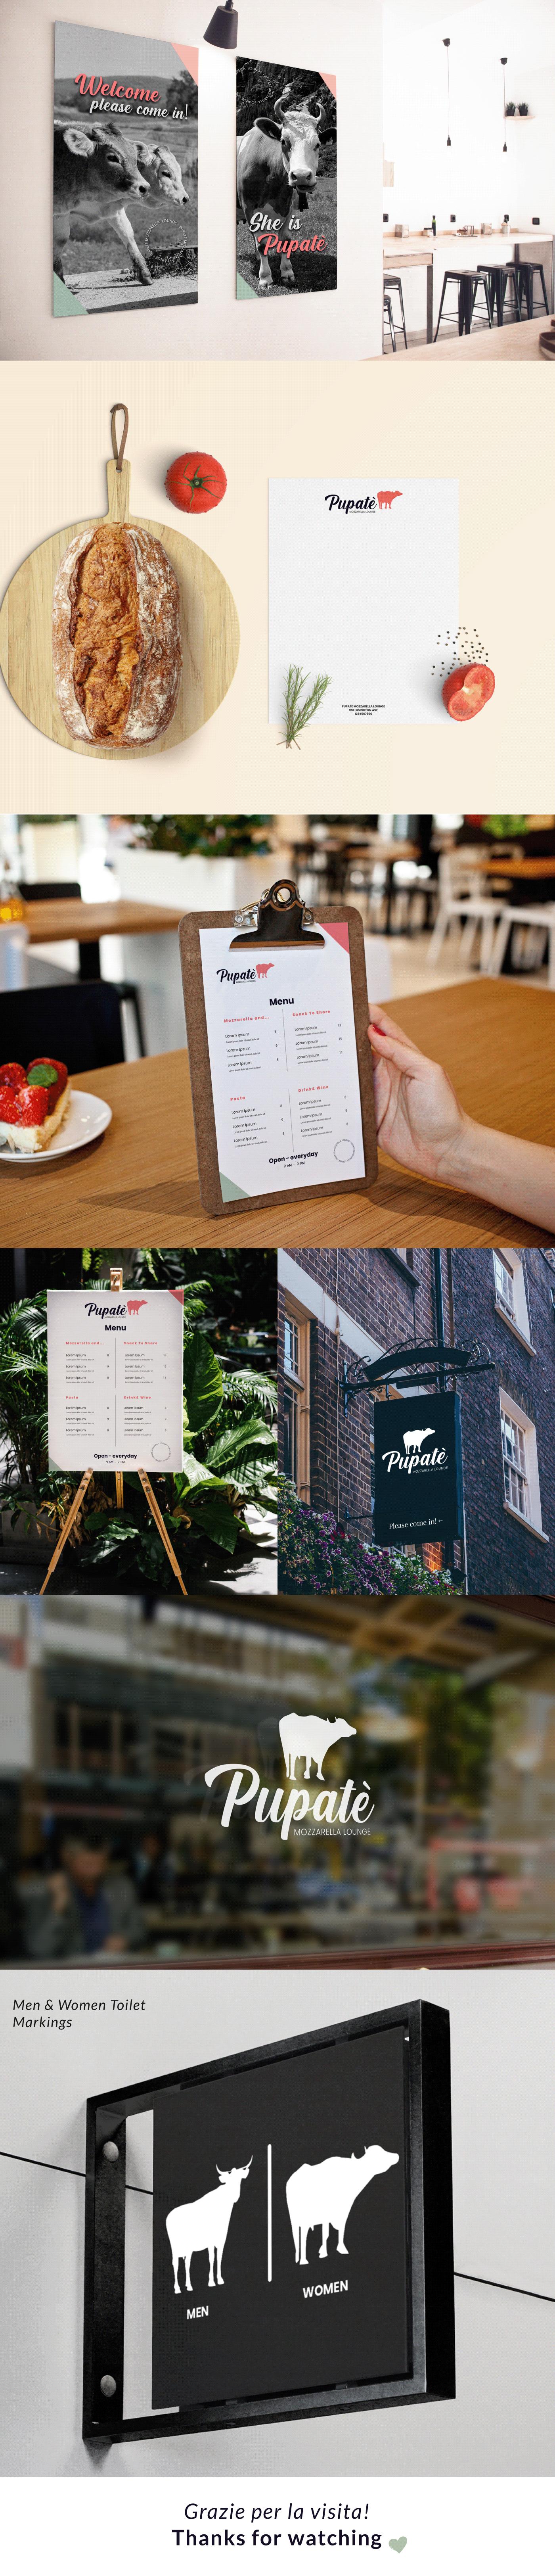 #LogoDesign brand idenity branding  identitàvisiva mozzarellalounge RestaurantBranding